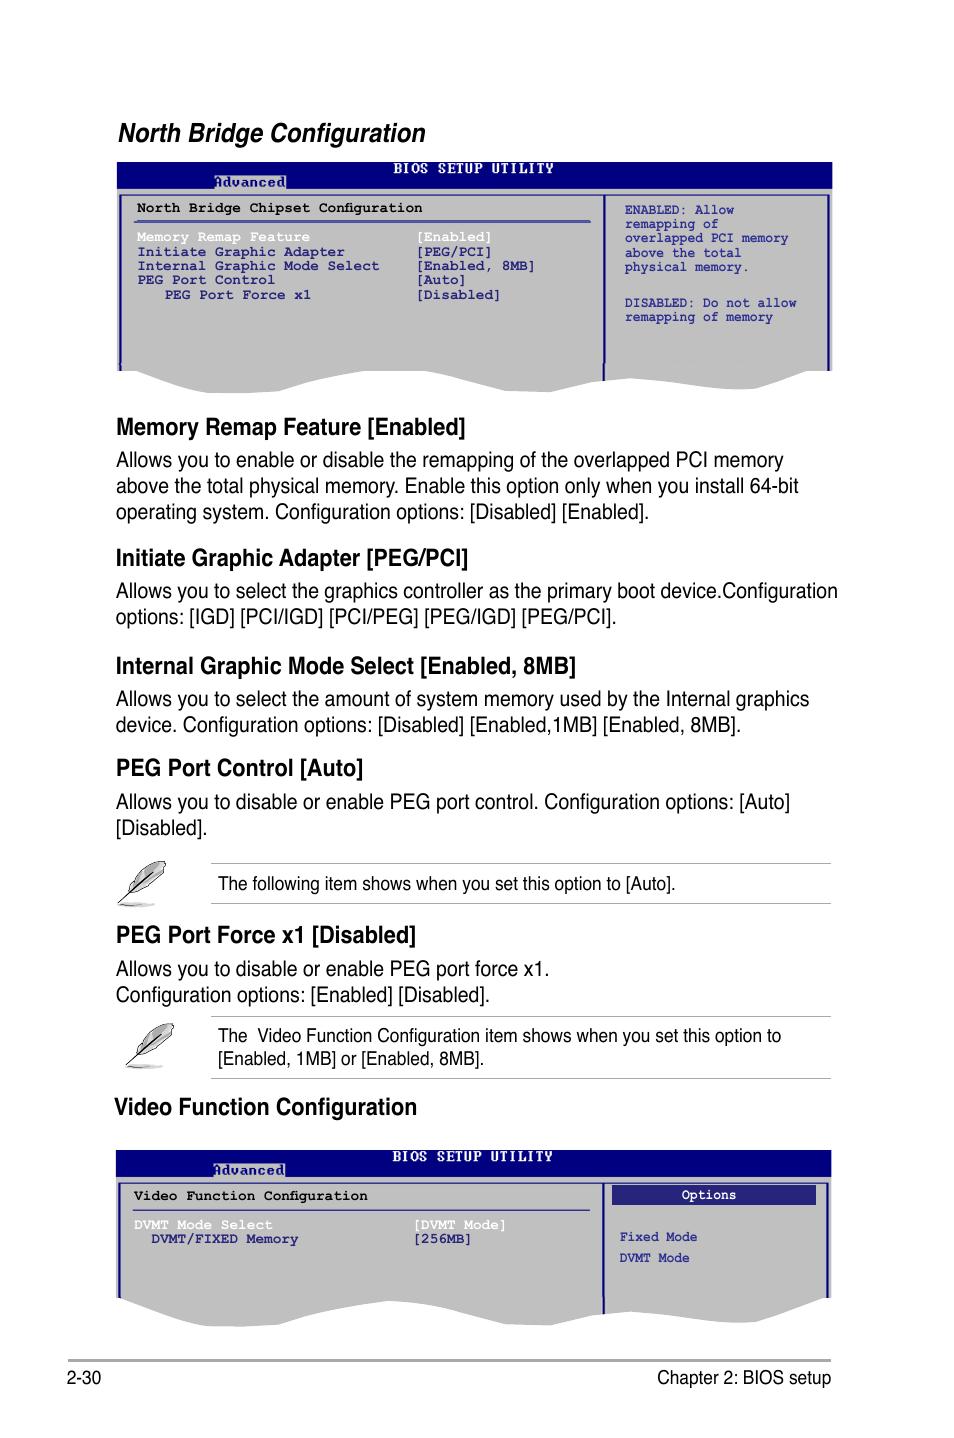 North bridge configuration, Video function configuration, Peg port